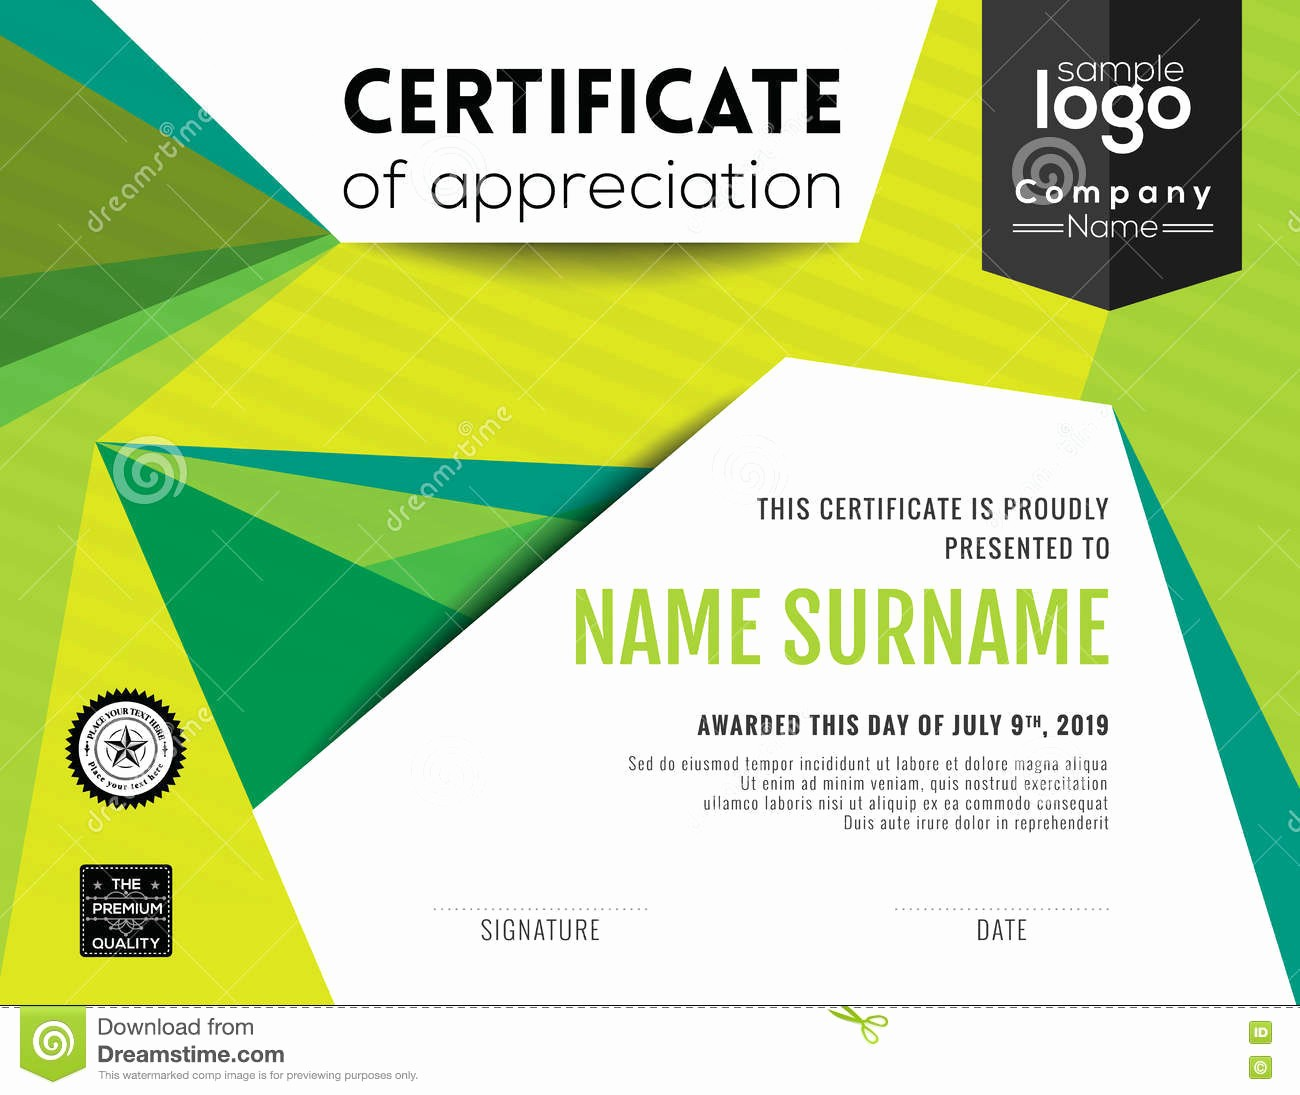 Certificate Background Design Free Download Best Of Modern Certificate Background Design Template Stock Vector